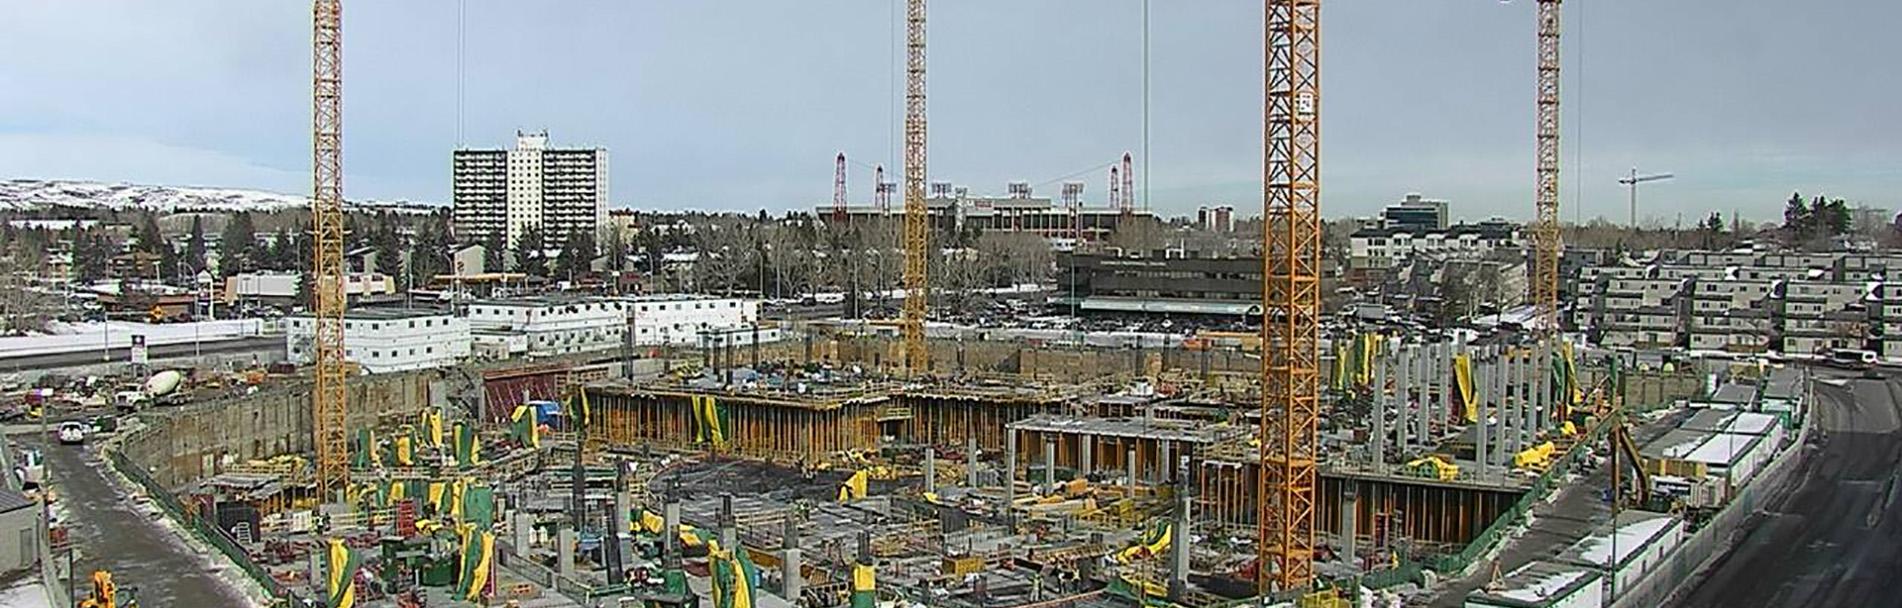 Calgary Cancer Centre - Building Envelope Case Study 1902x608